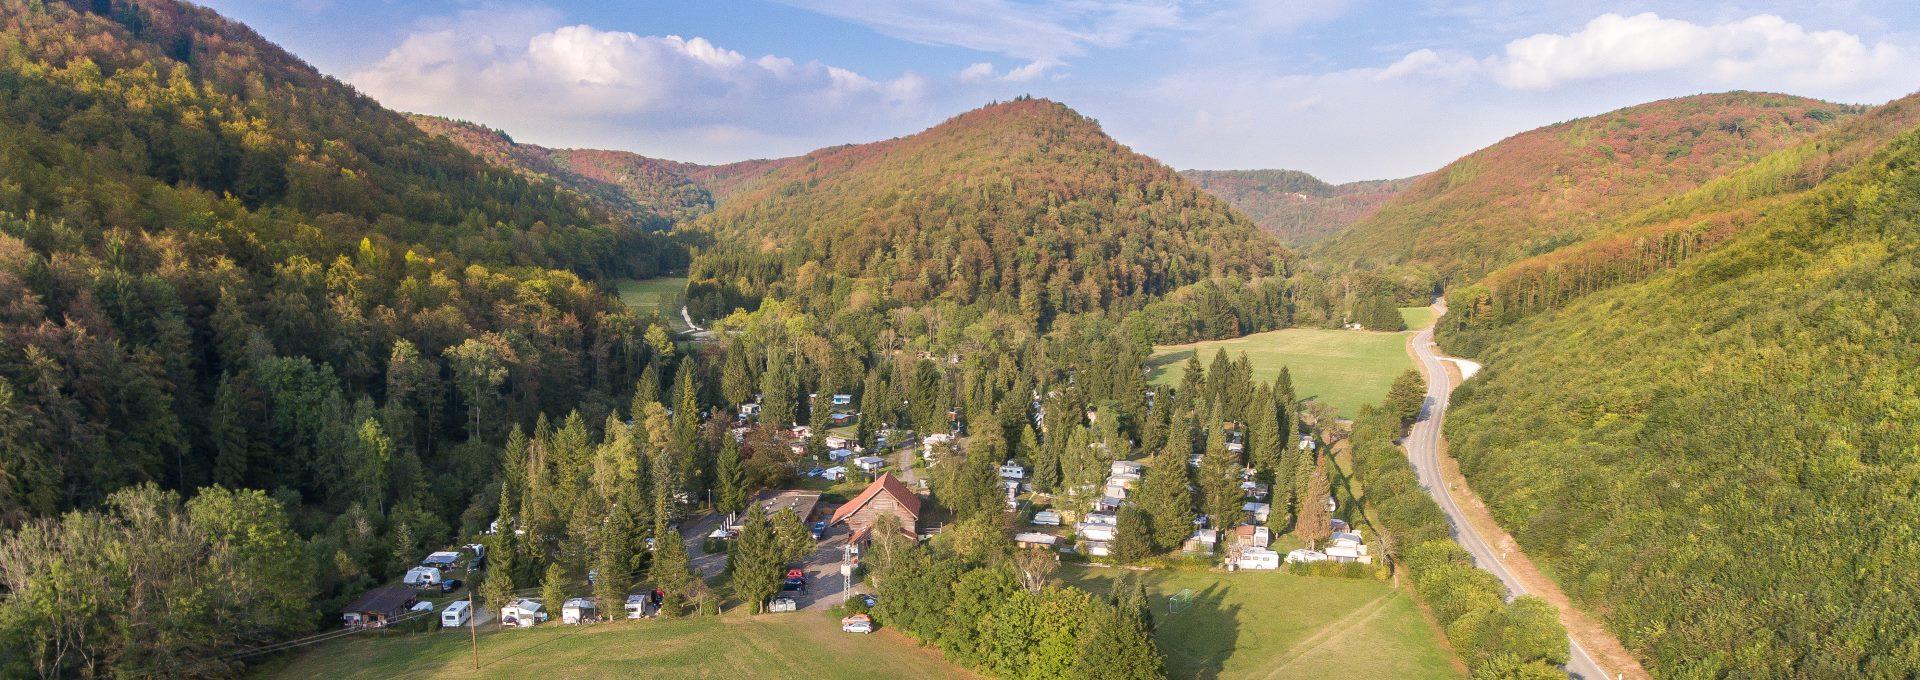 Campingplatz Luftbild